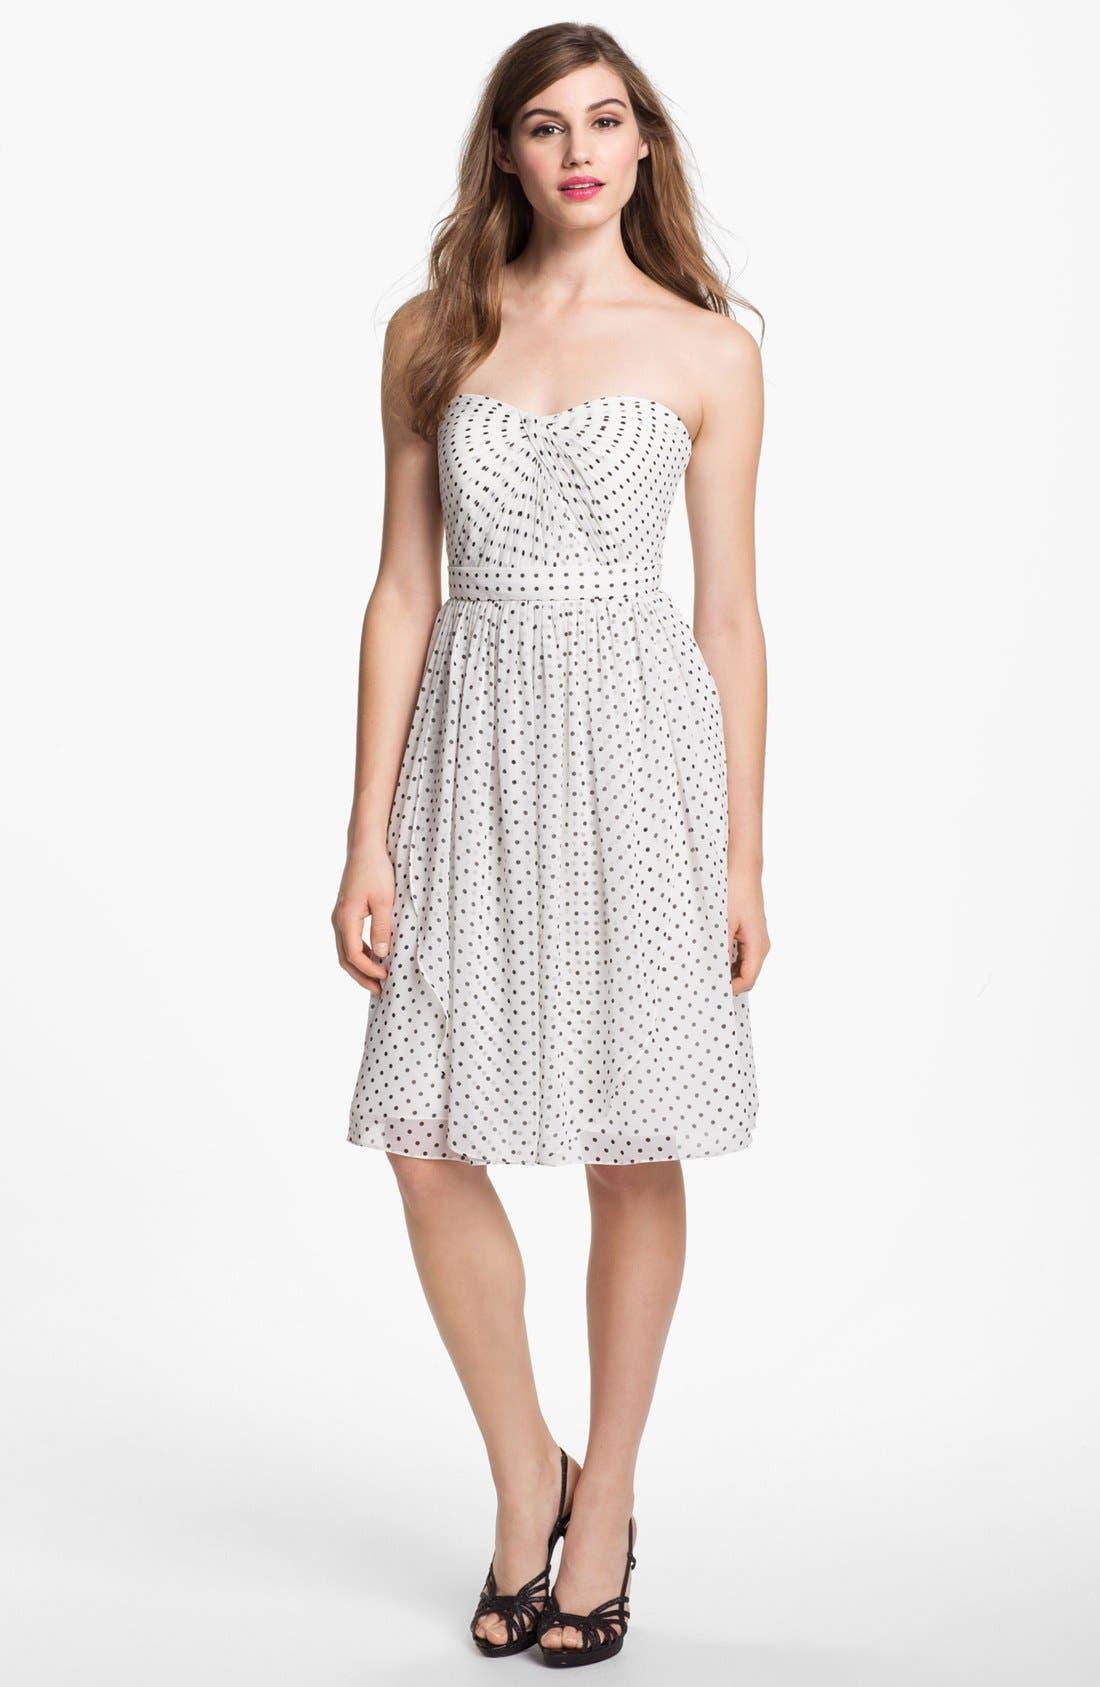 Alternate Image 1 Selected - Jenny Yoo 'Keira' Convertible Dot Chiffon Fit & Flare Dress